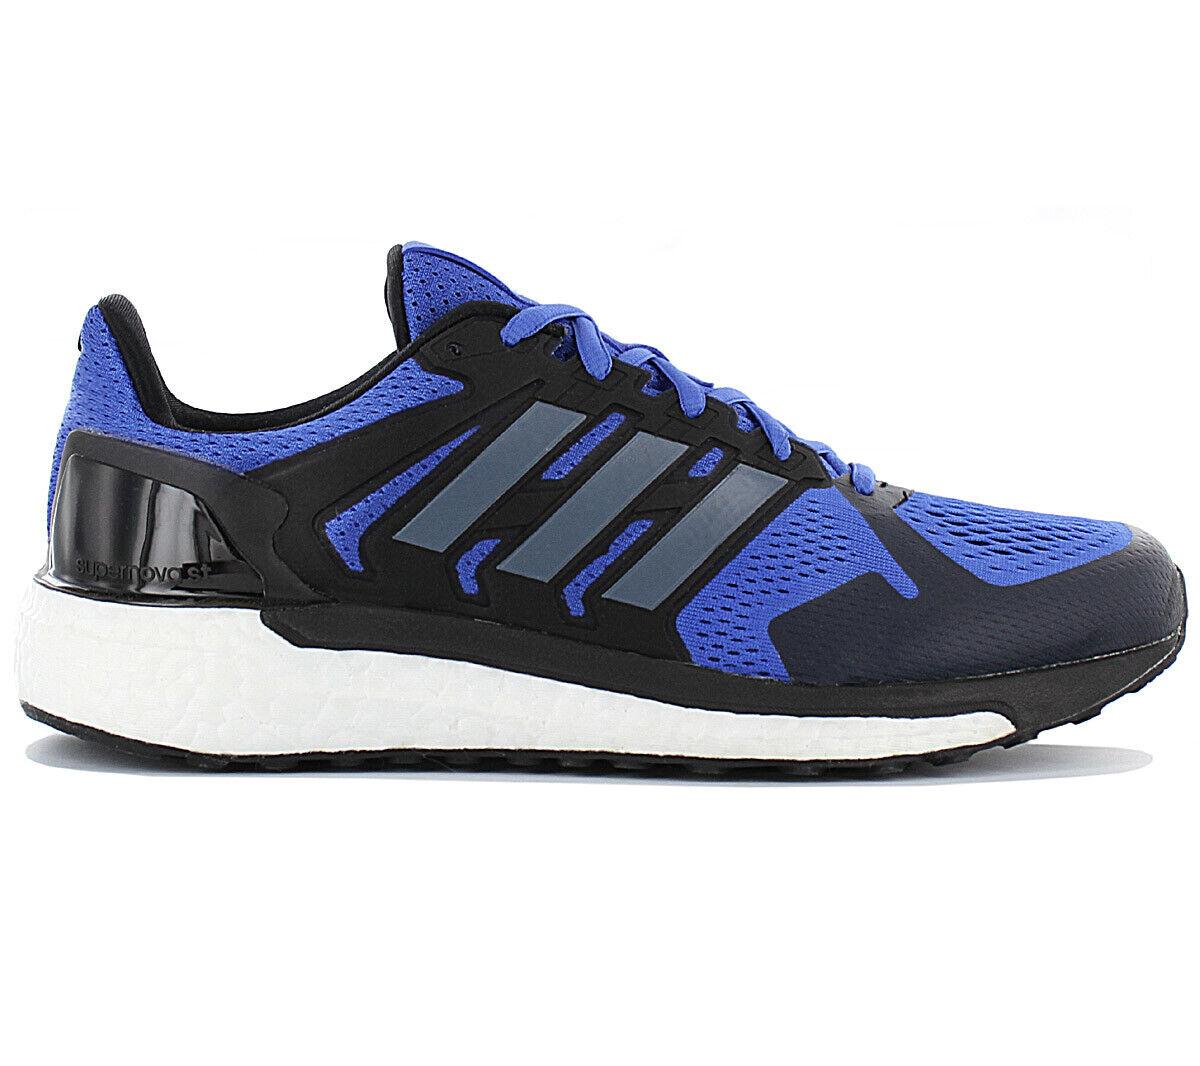 Adidas Supernova st M Boost Hombre Zapatillas de Correr Cg4031 Running Jogging